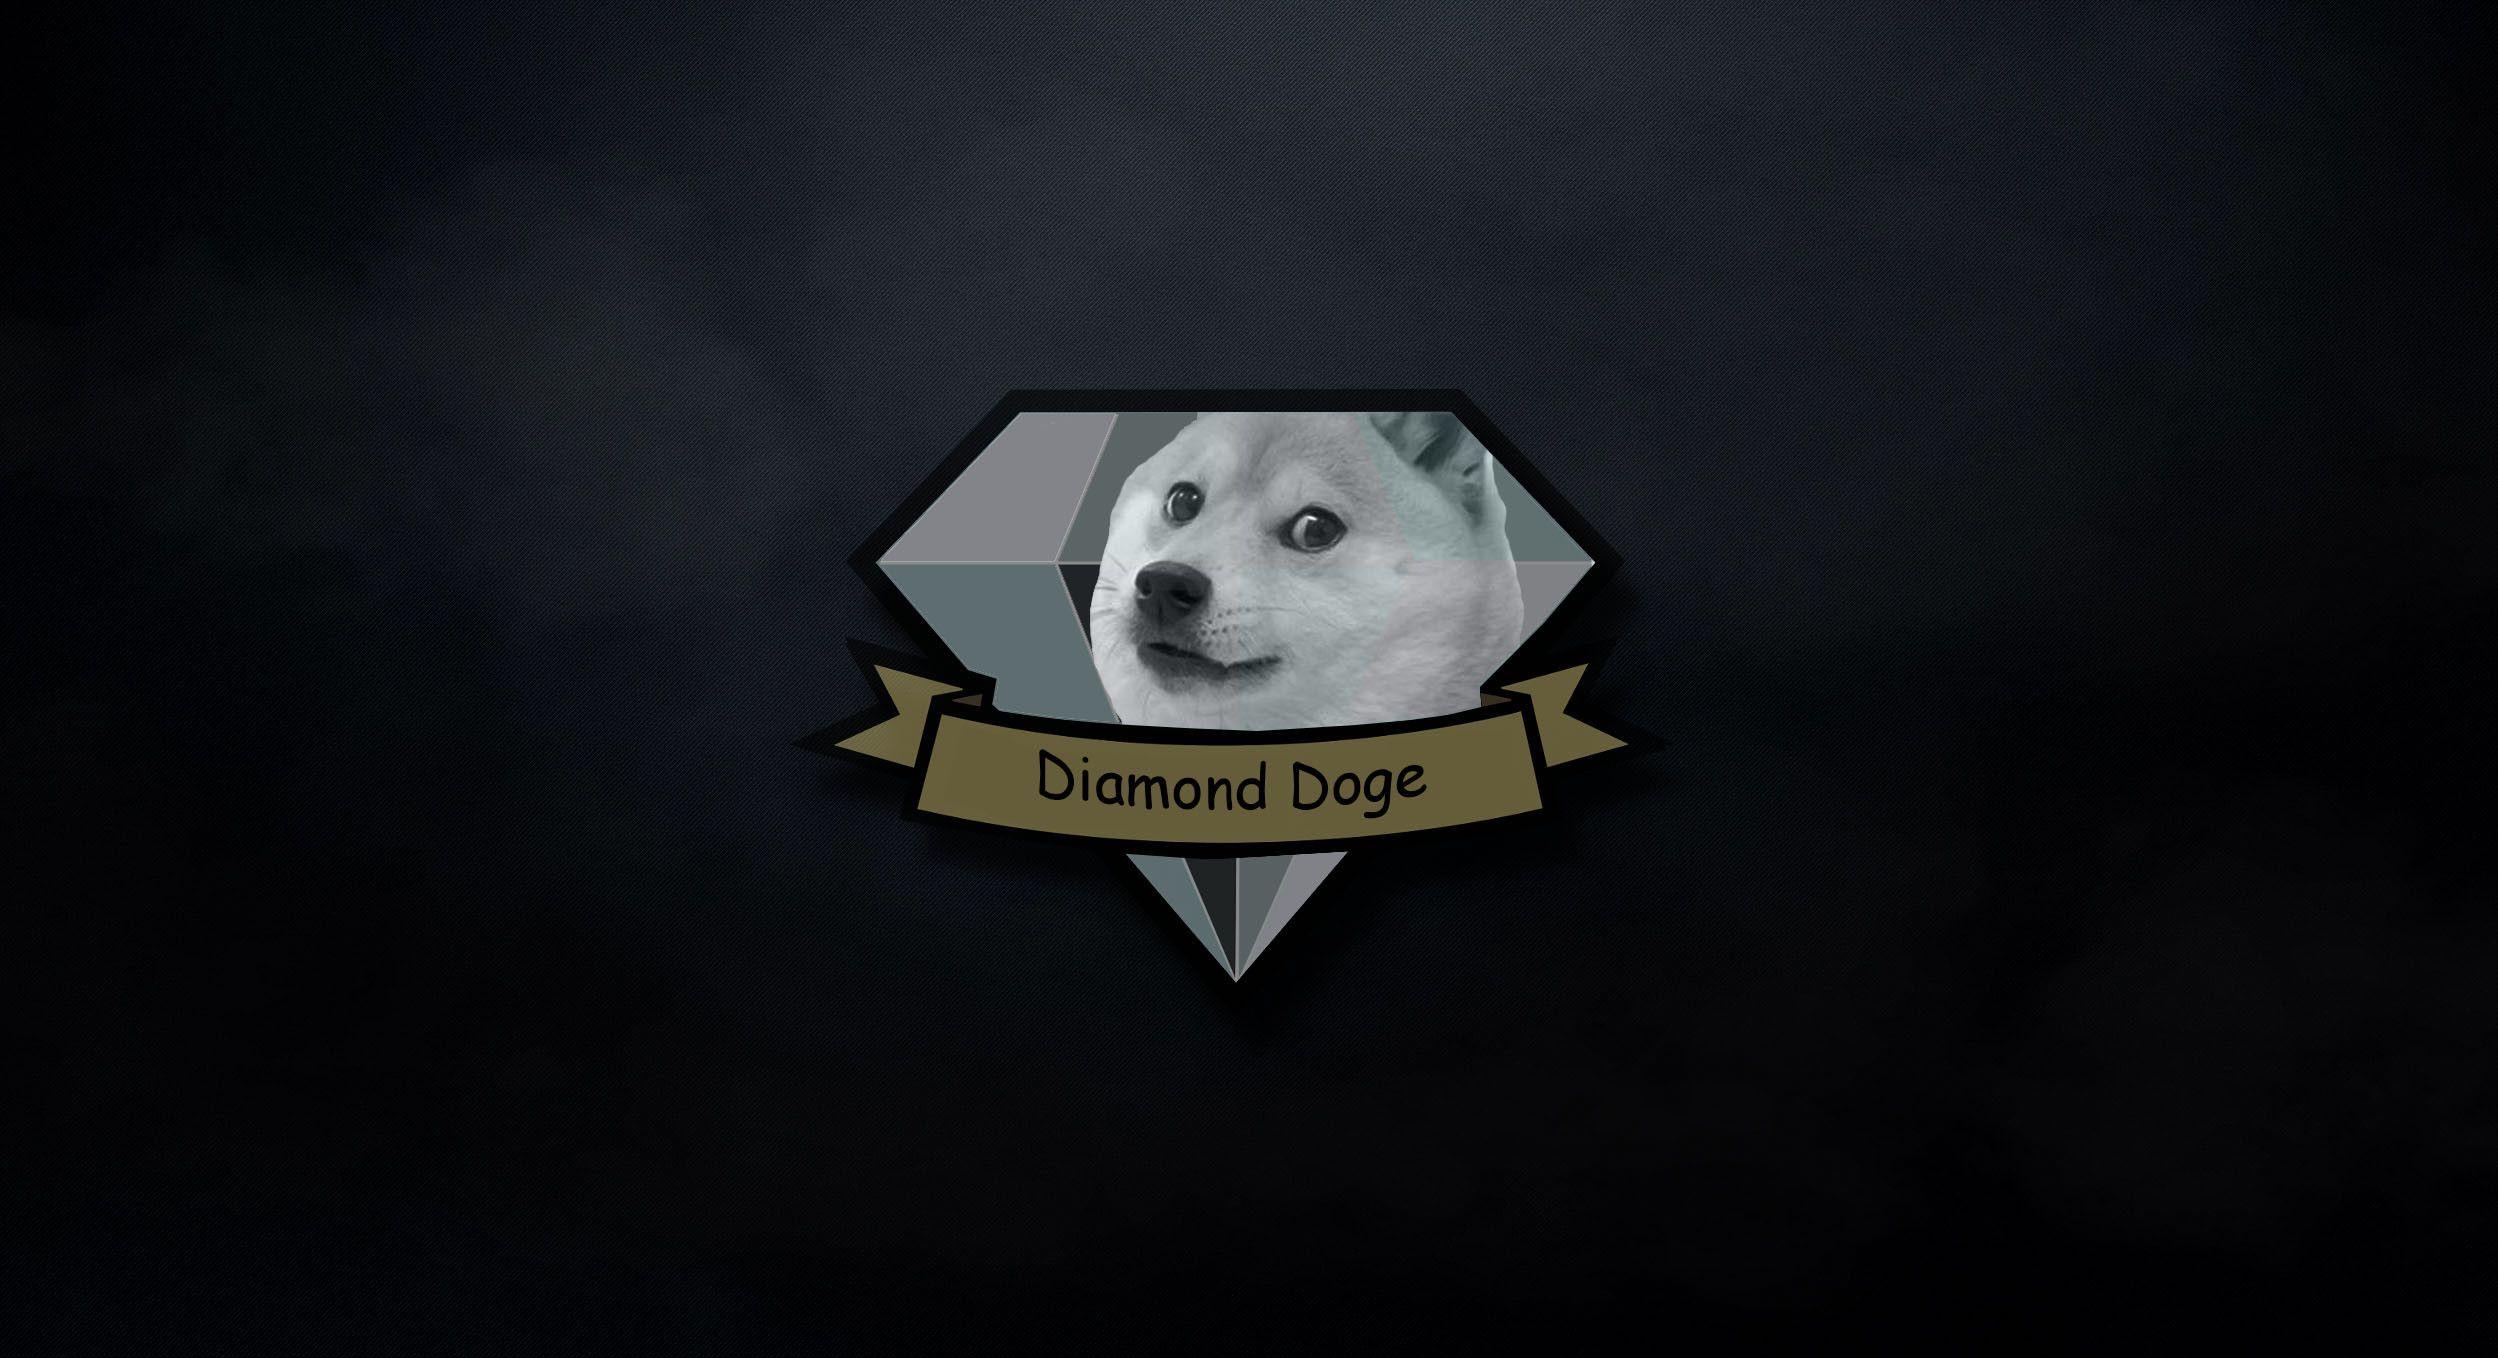 76 Doge Meme Wallpapers on WallpaperPlay Doge meme, Doge